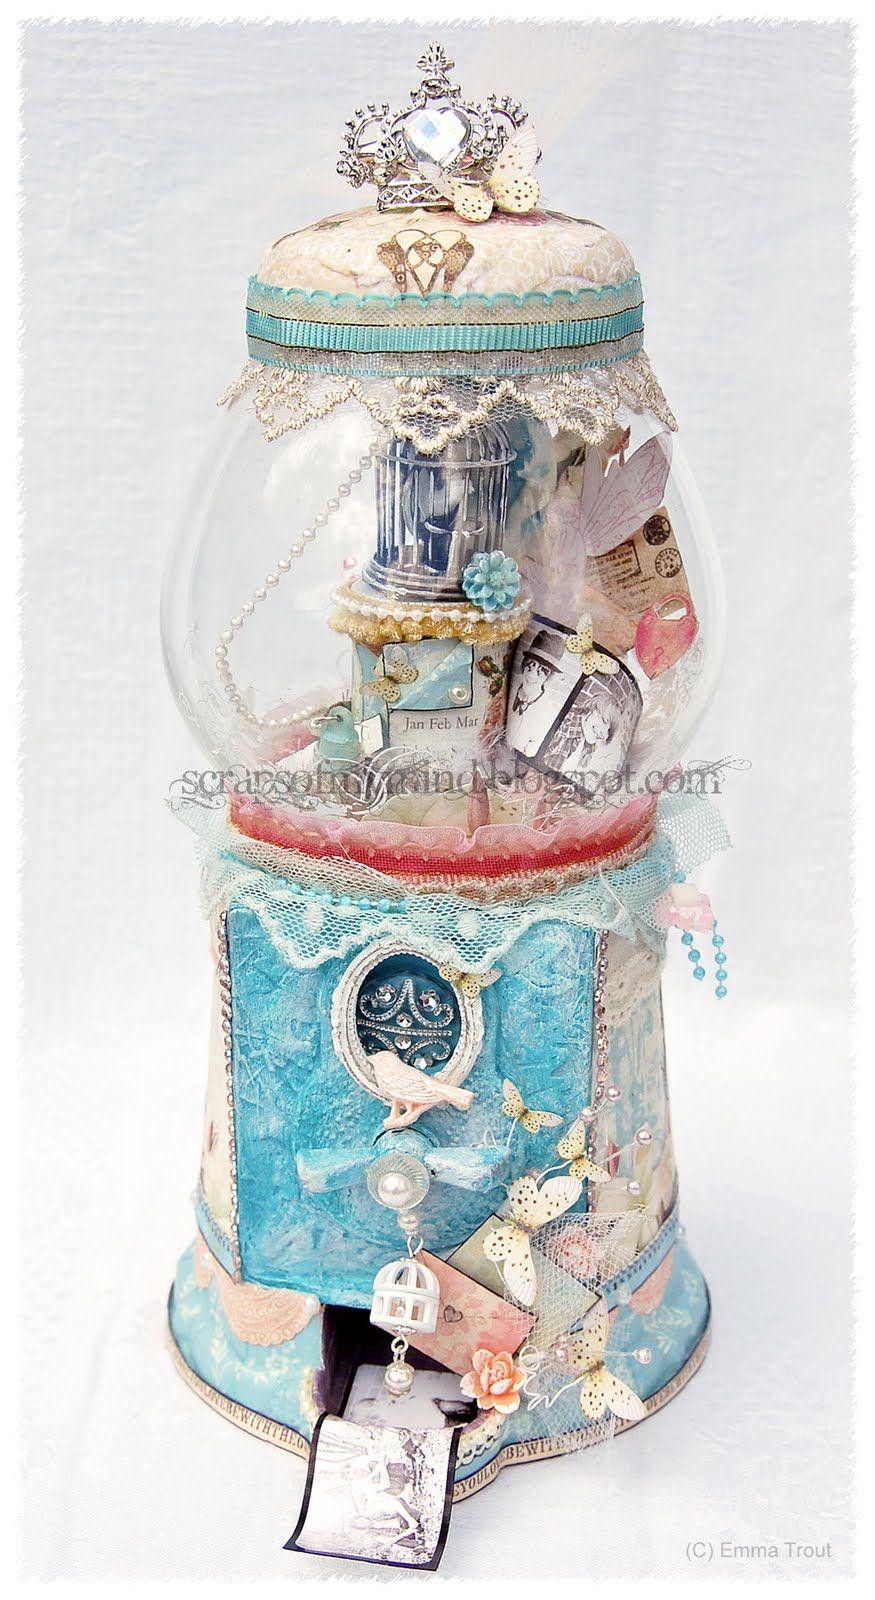 An altered bubblegum machine/ memory jar by DT member Emma Trout